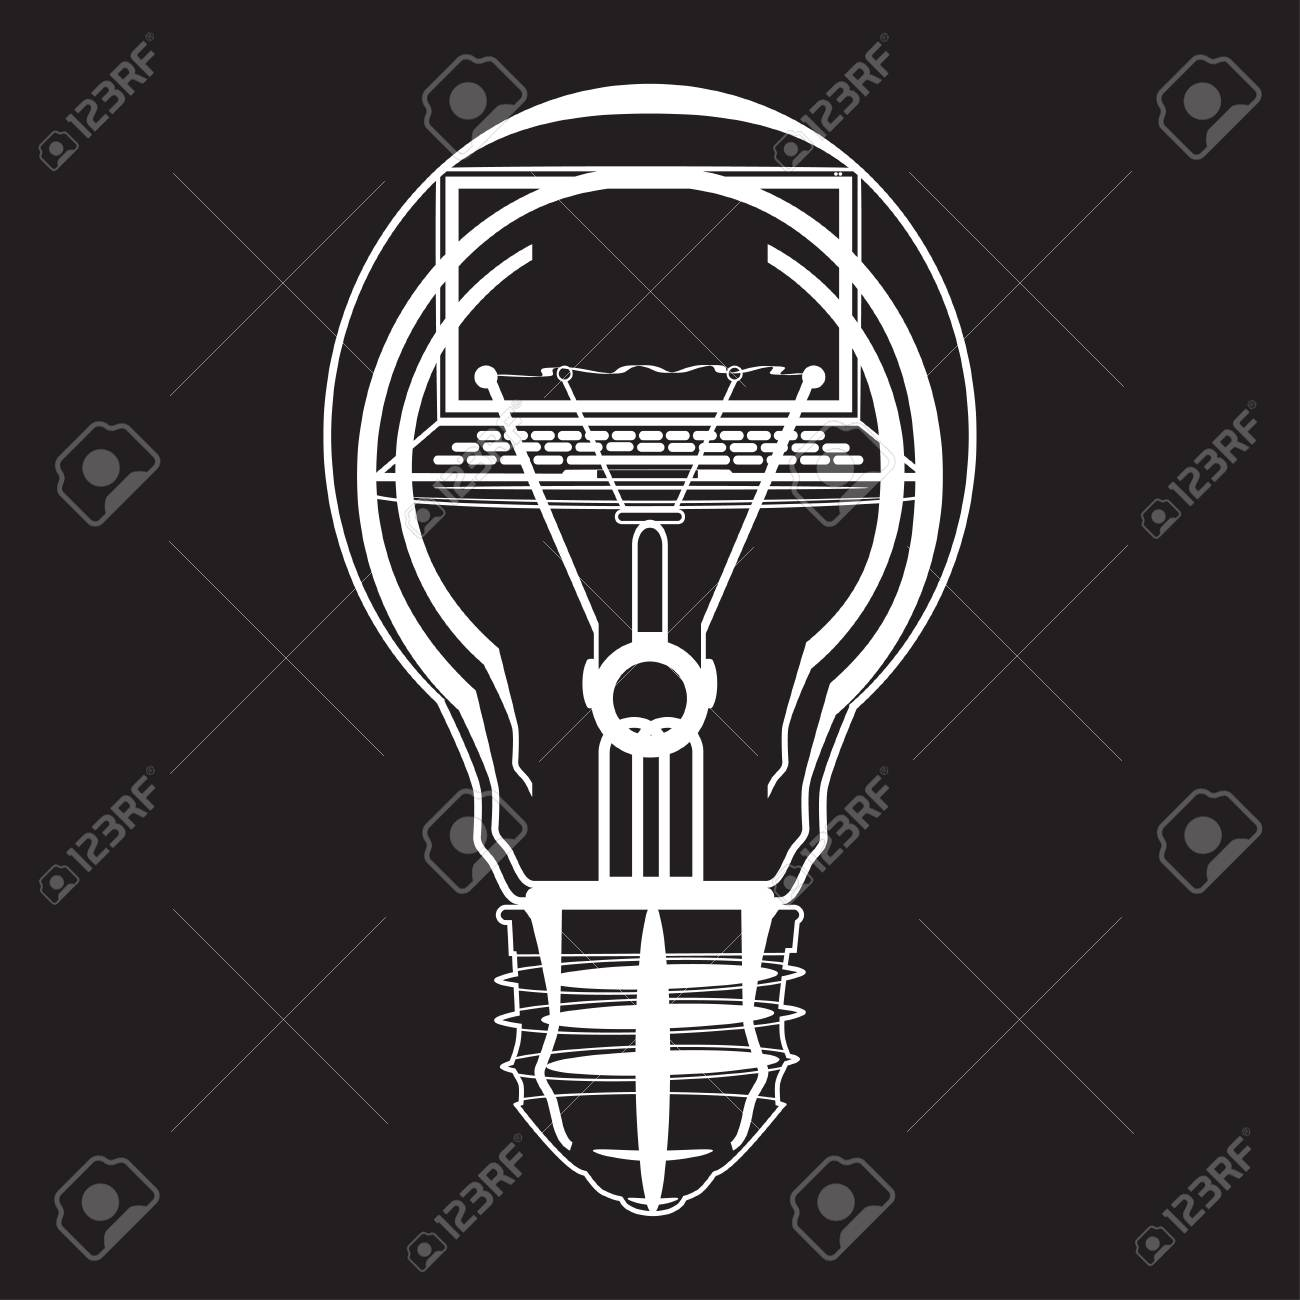 Marvelous Laptop Inside Of Light Bulb Black And White Vector Illustration. Creative  Idea, Software Development